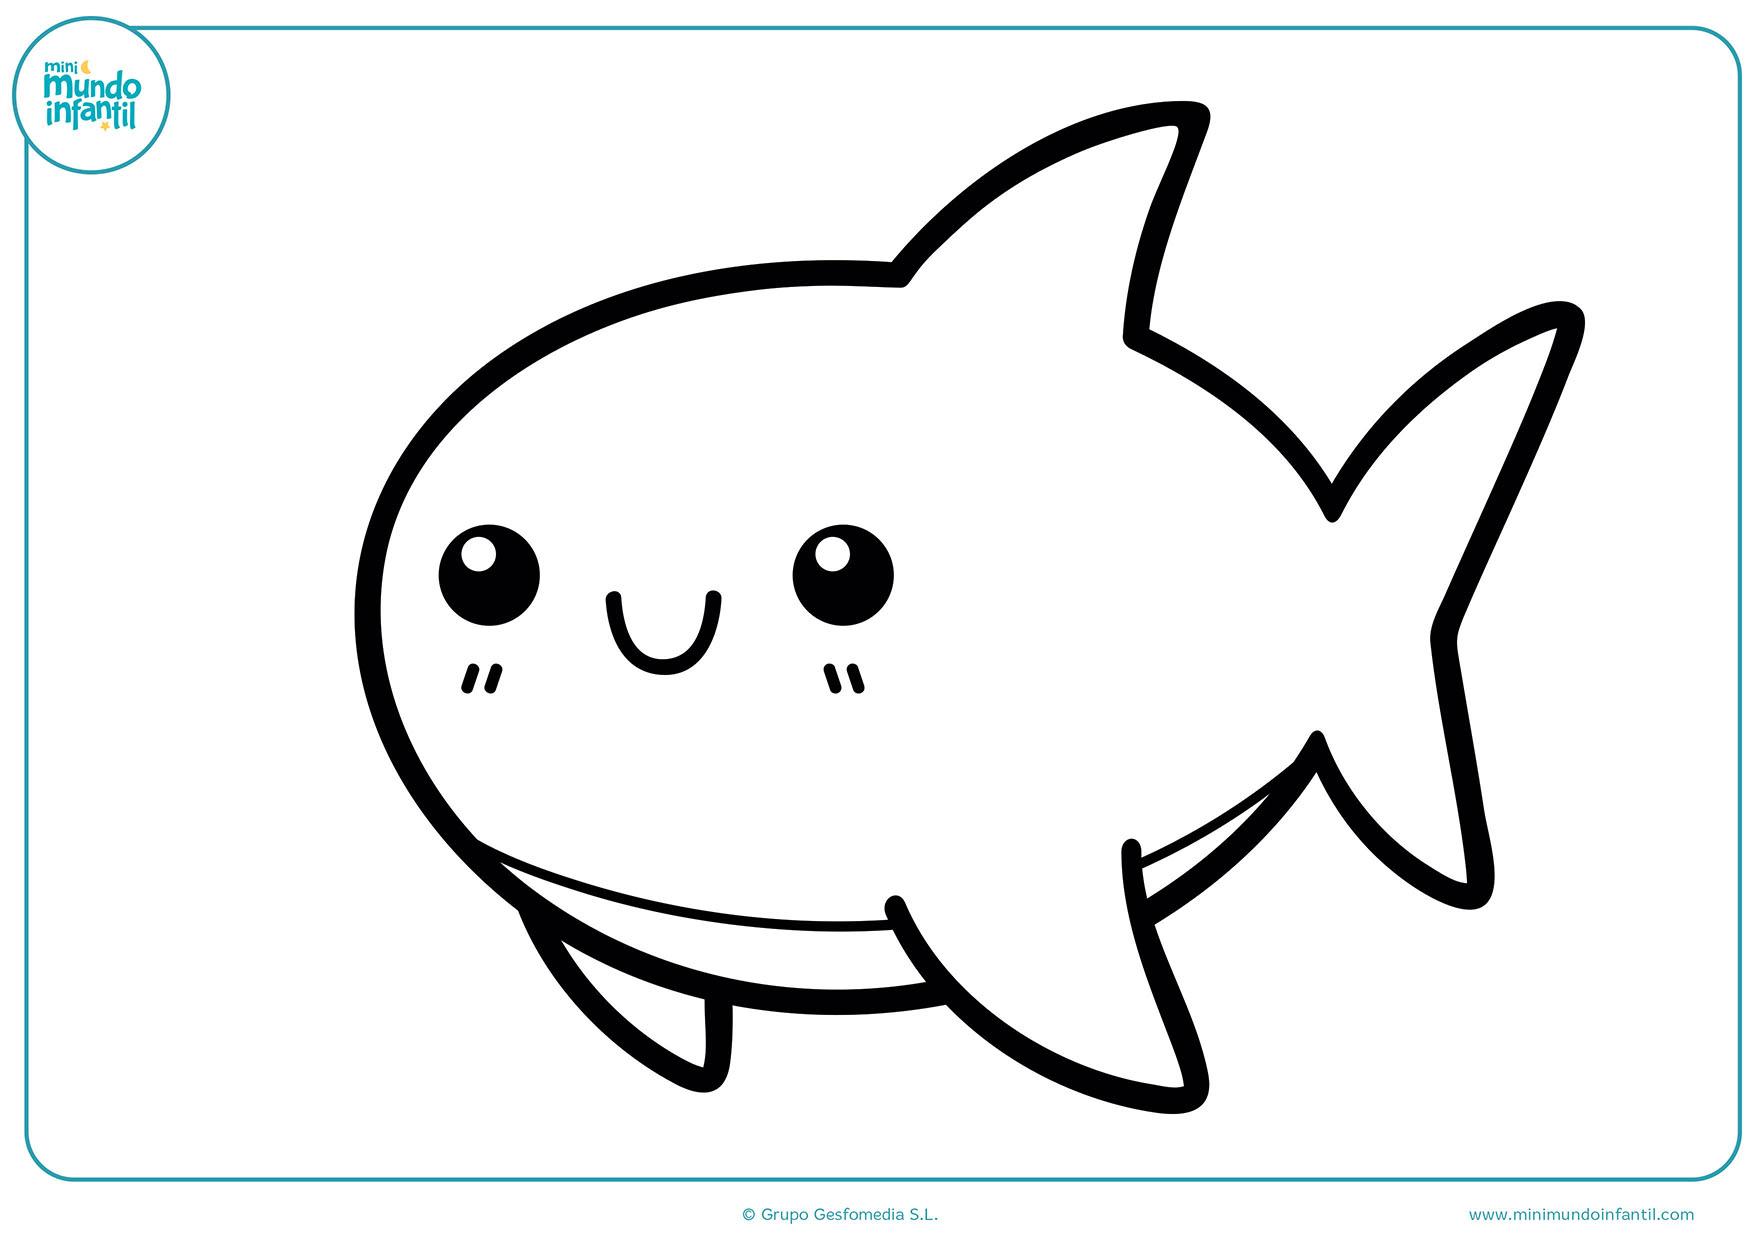 Dibujos De Tiburones Para Colorear. Fabulous Dibujo Para Colorear ...